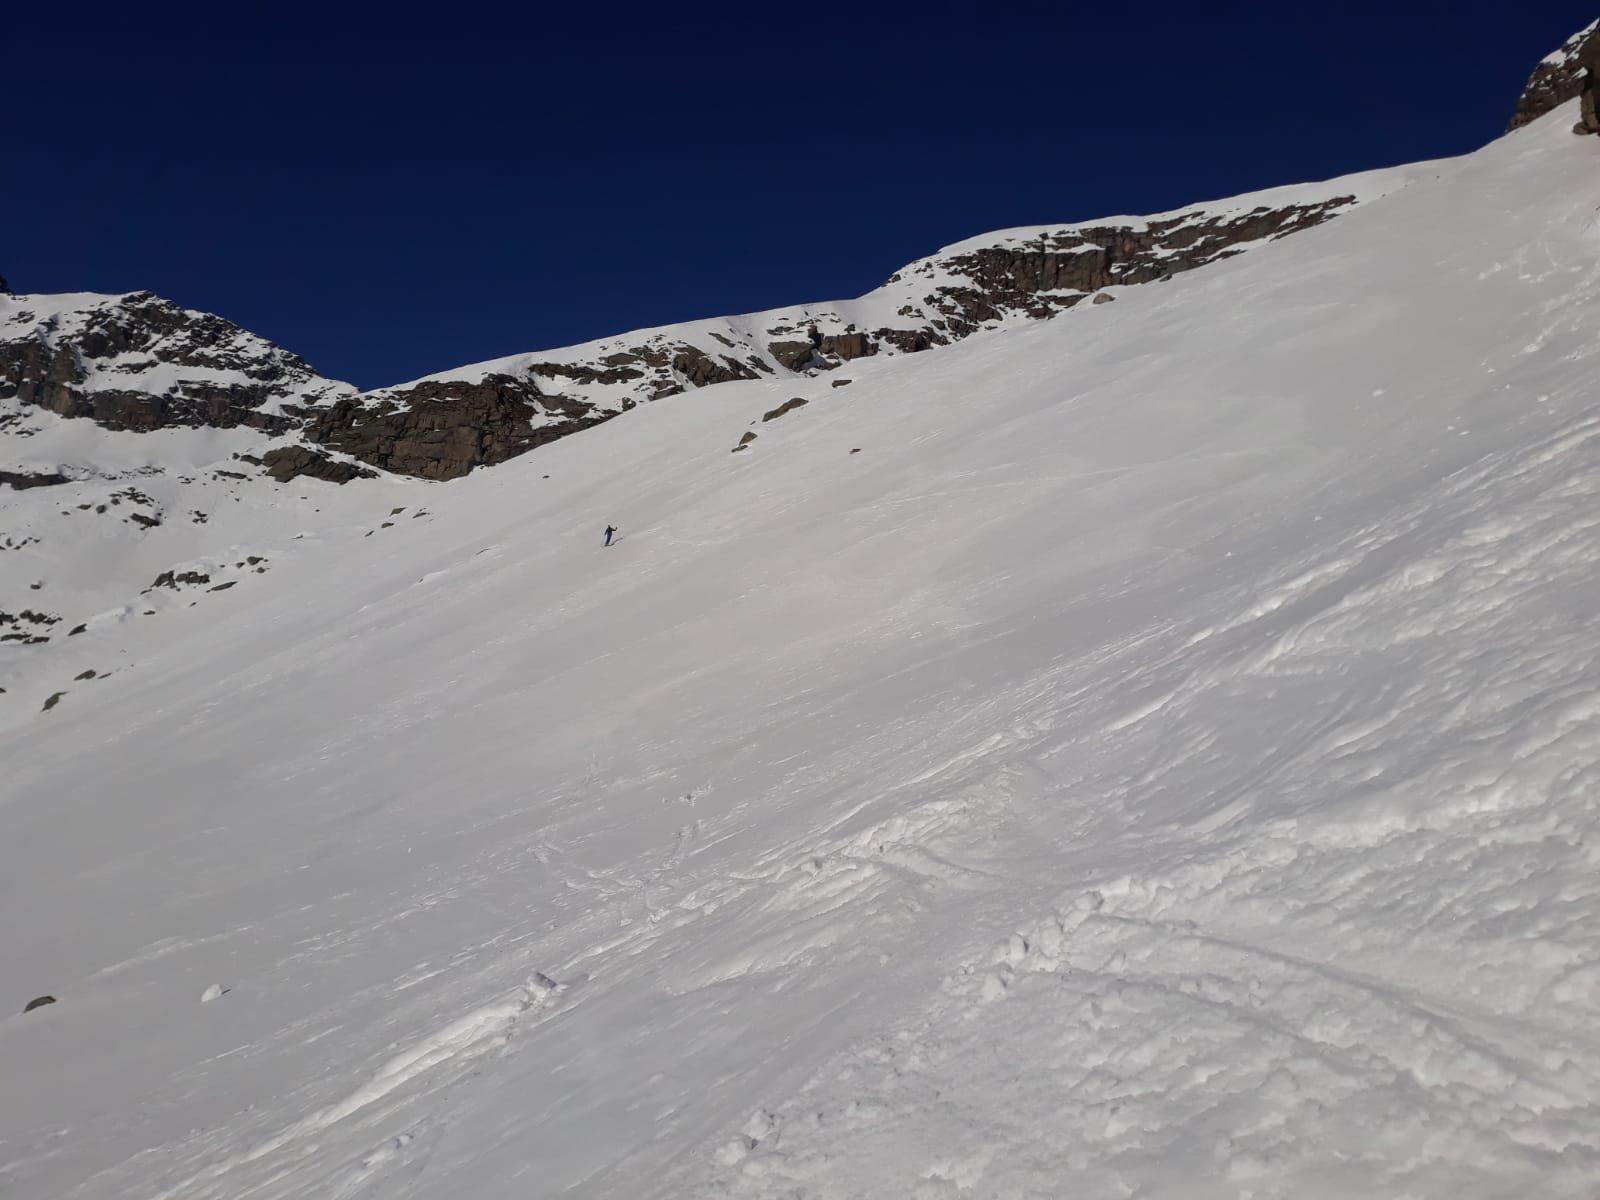 Barrouard (Monte) Canale Ovest 2020-01-02